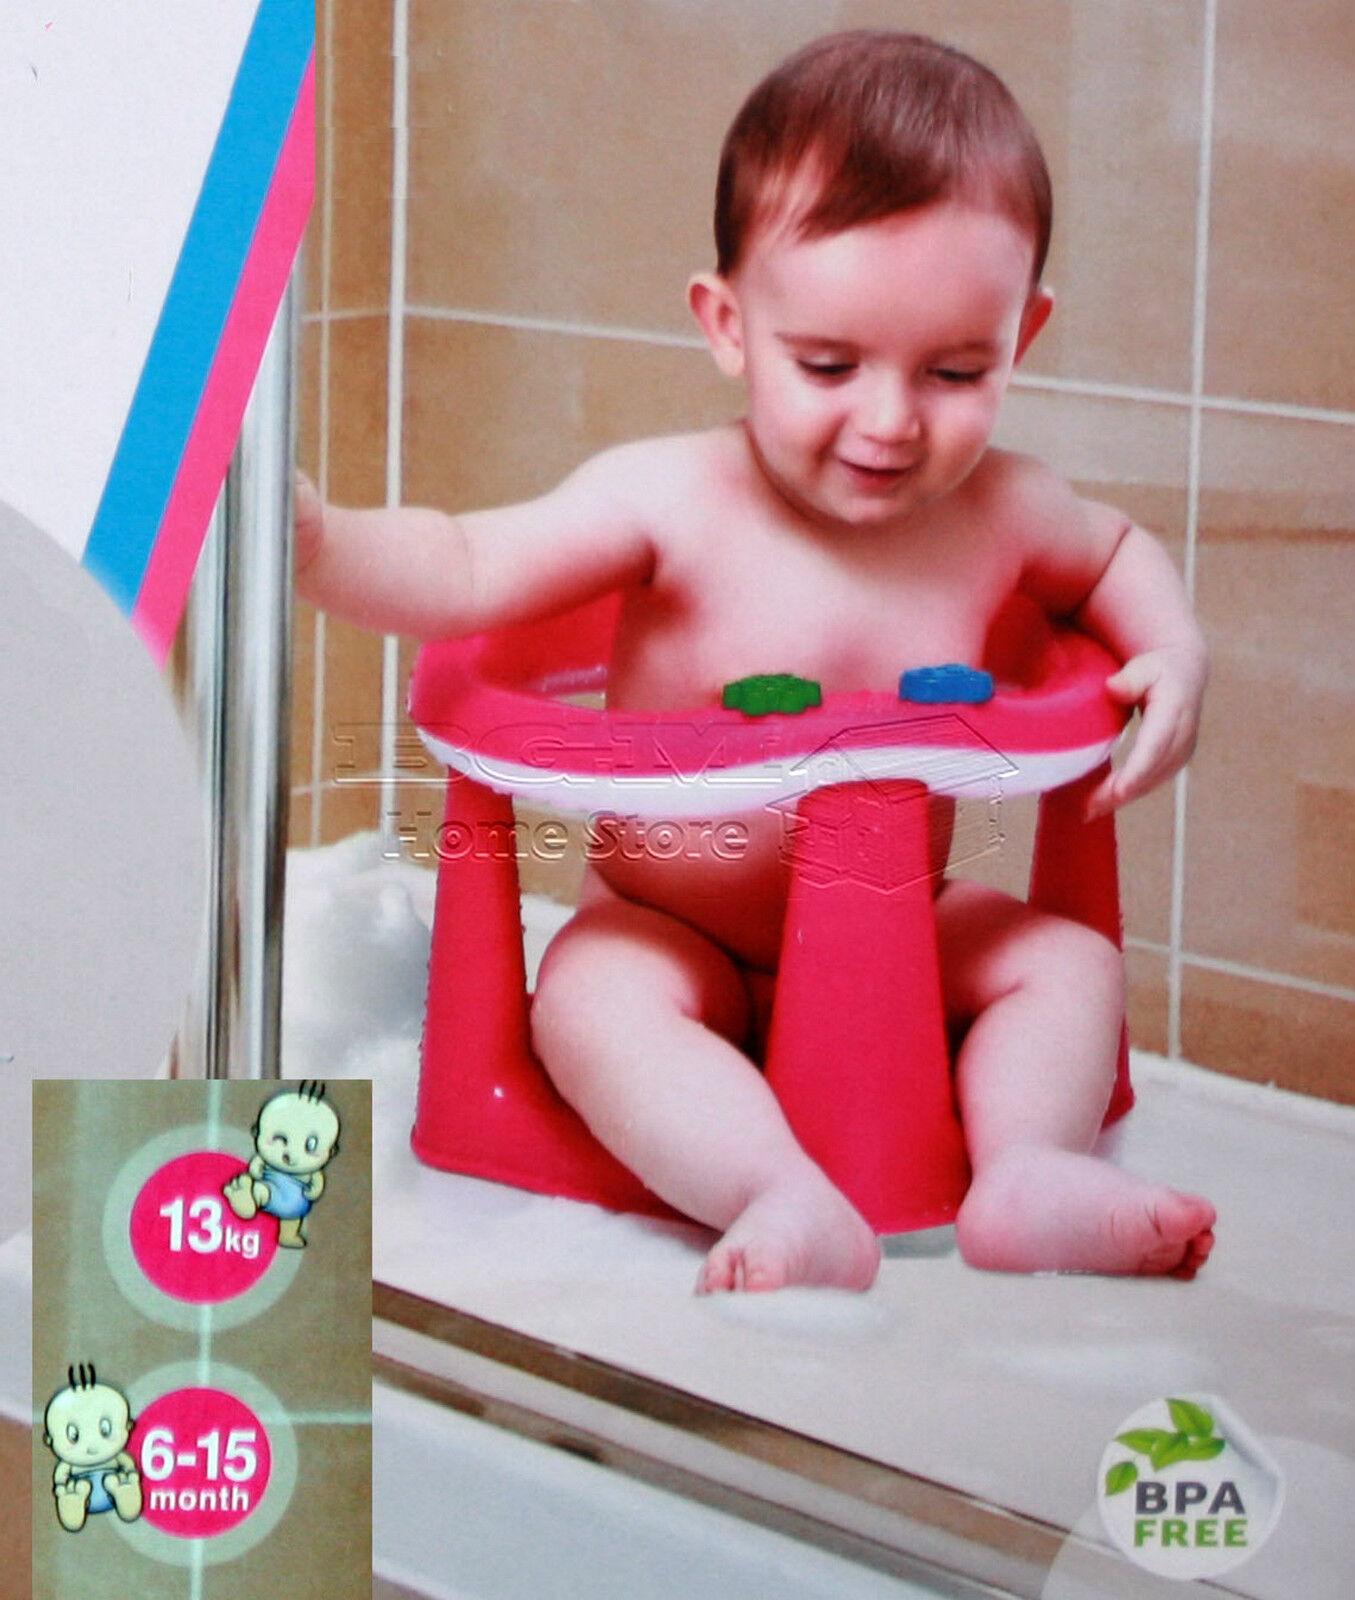 Awesome Baby Bath Safety Embellishment - Luxurious Bathtub Ideas and ...